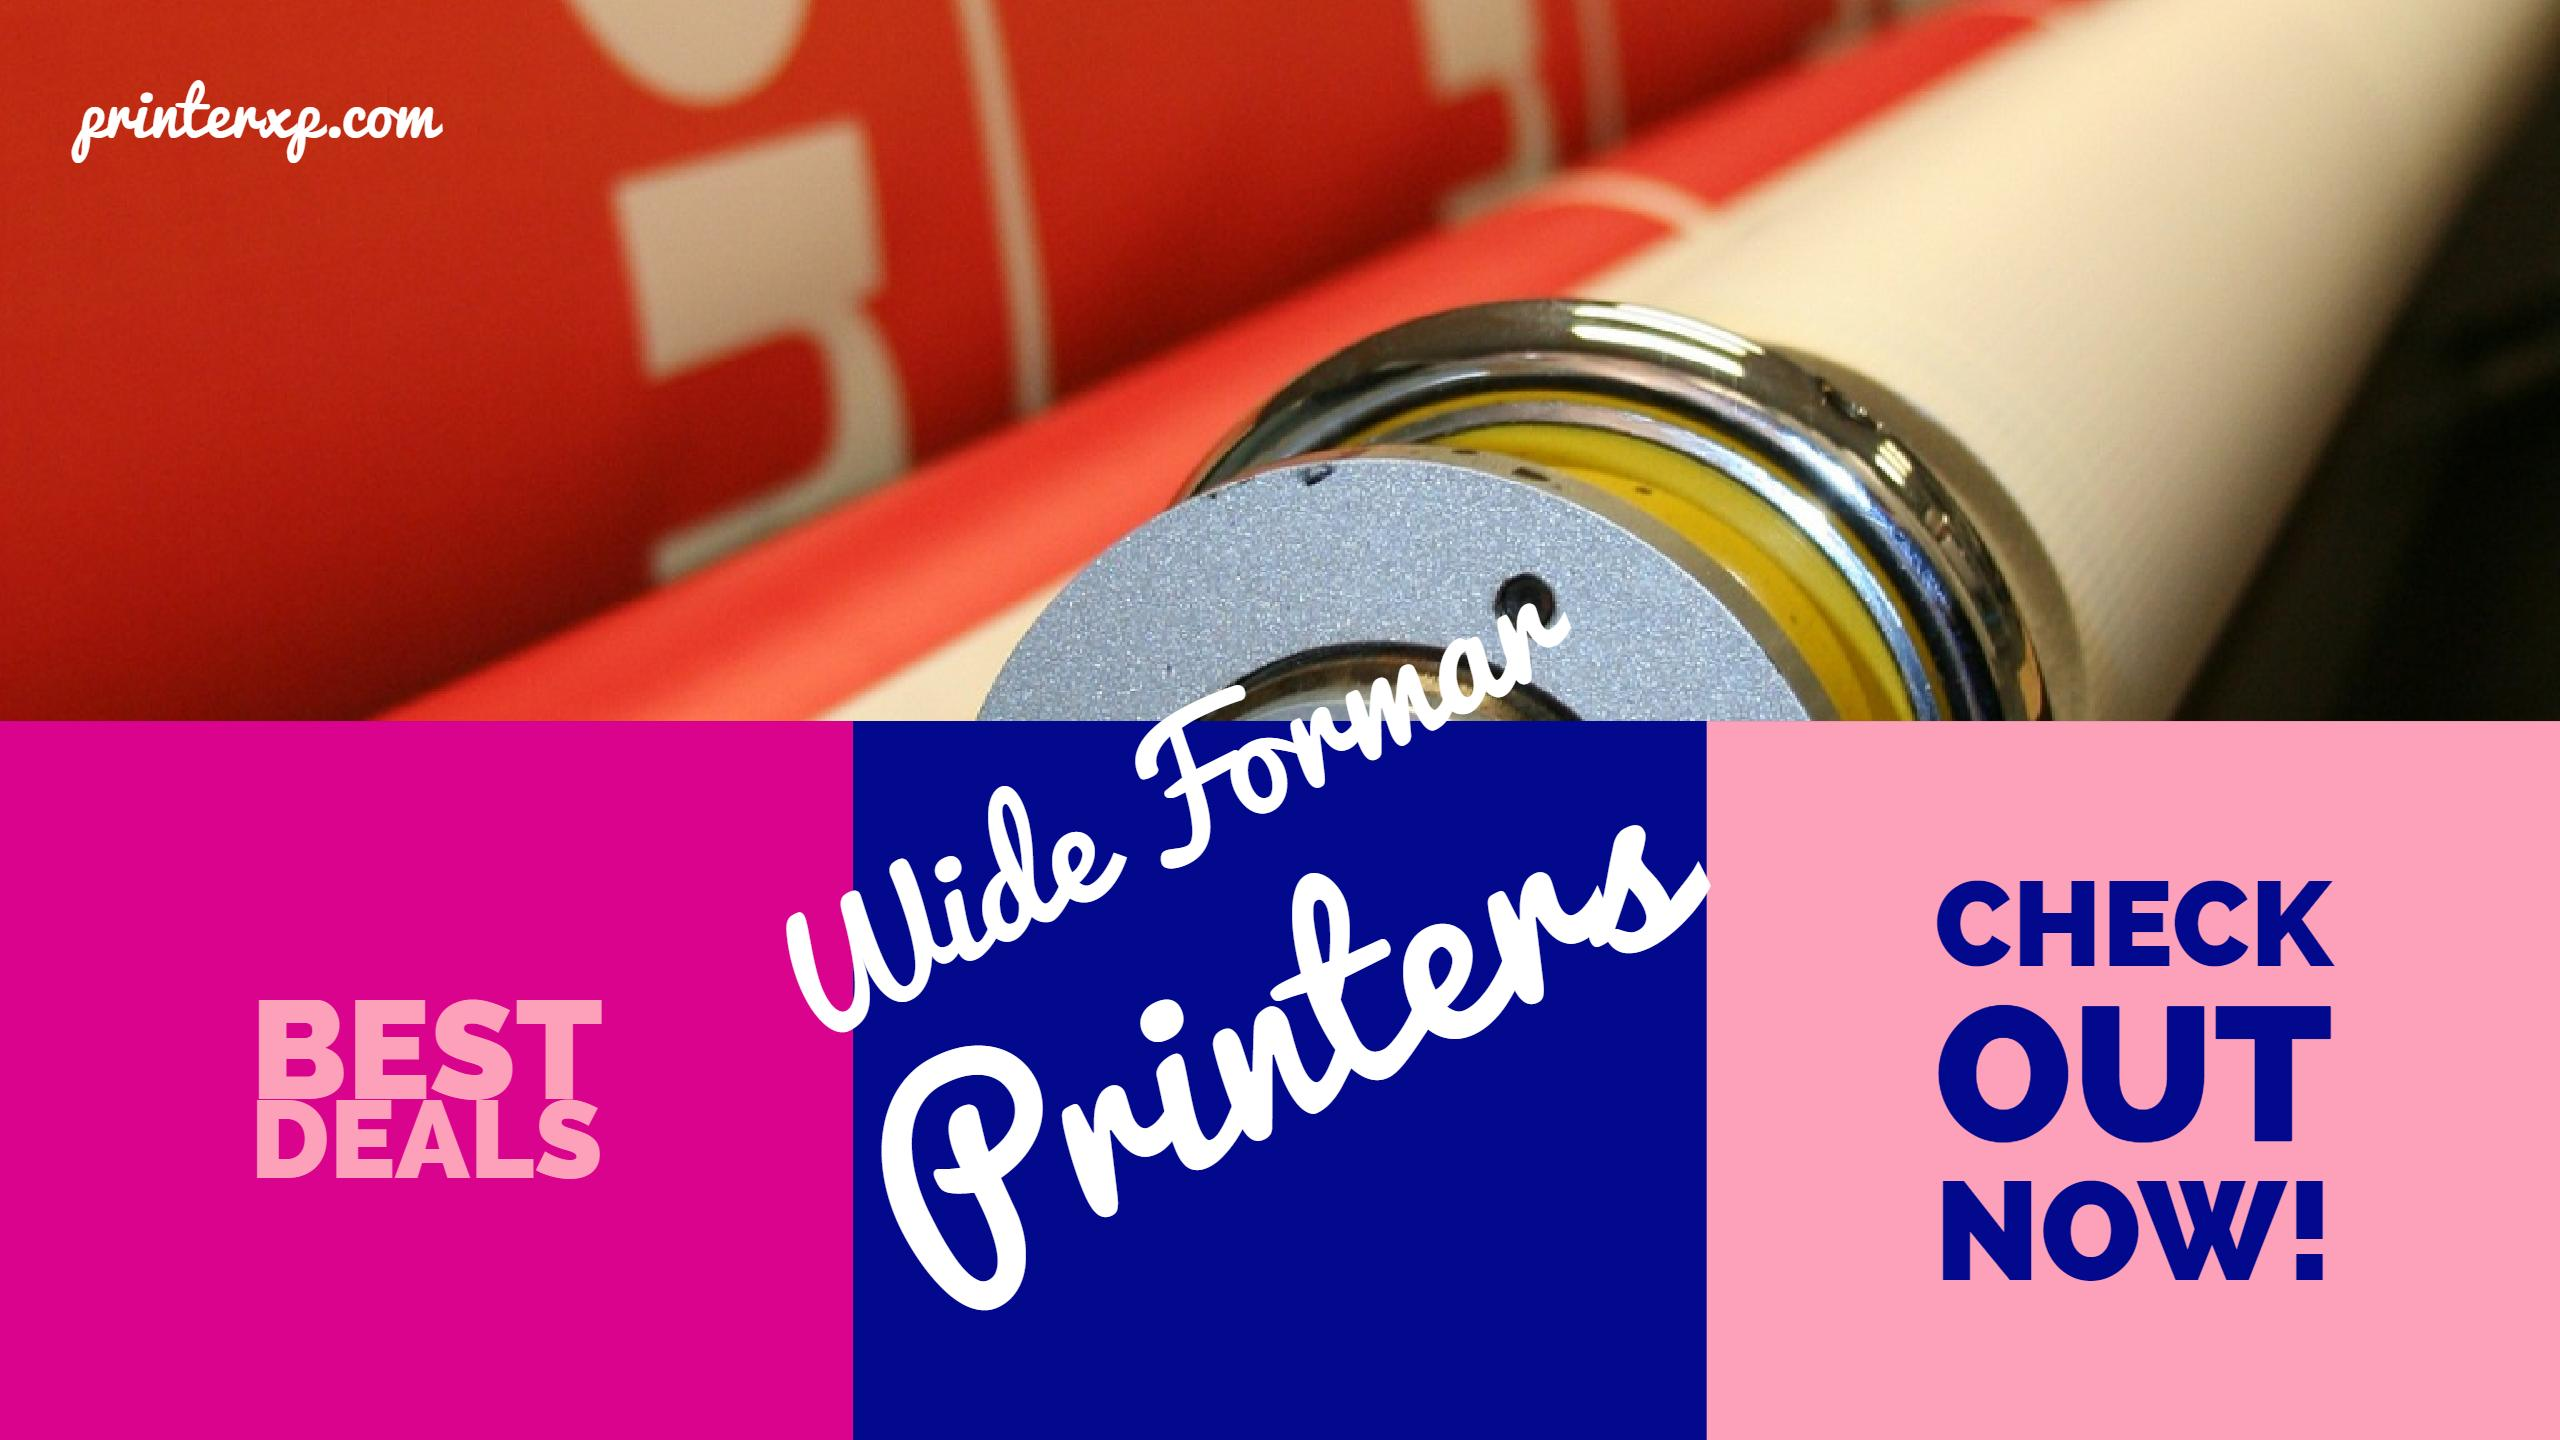 Best Wide Format Printers